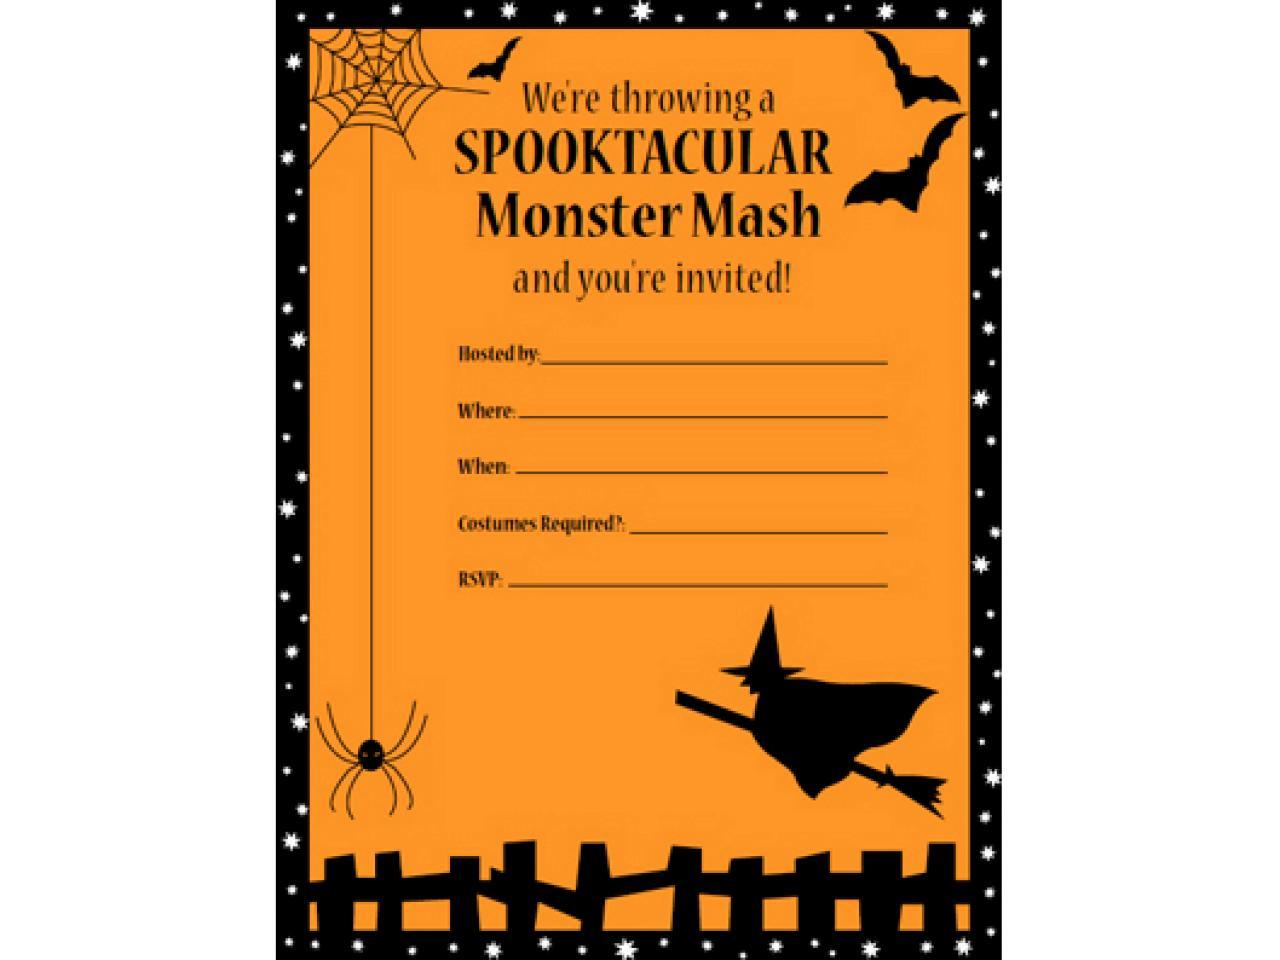 Free Halloween Templates 60 Premium Free Psd Halloween Flyer - Free Printable Halloween Flyer Templates